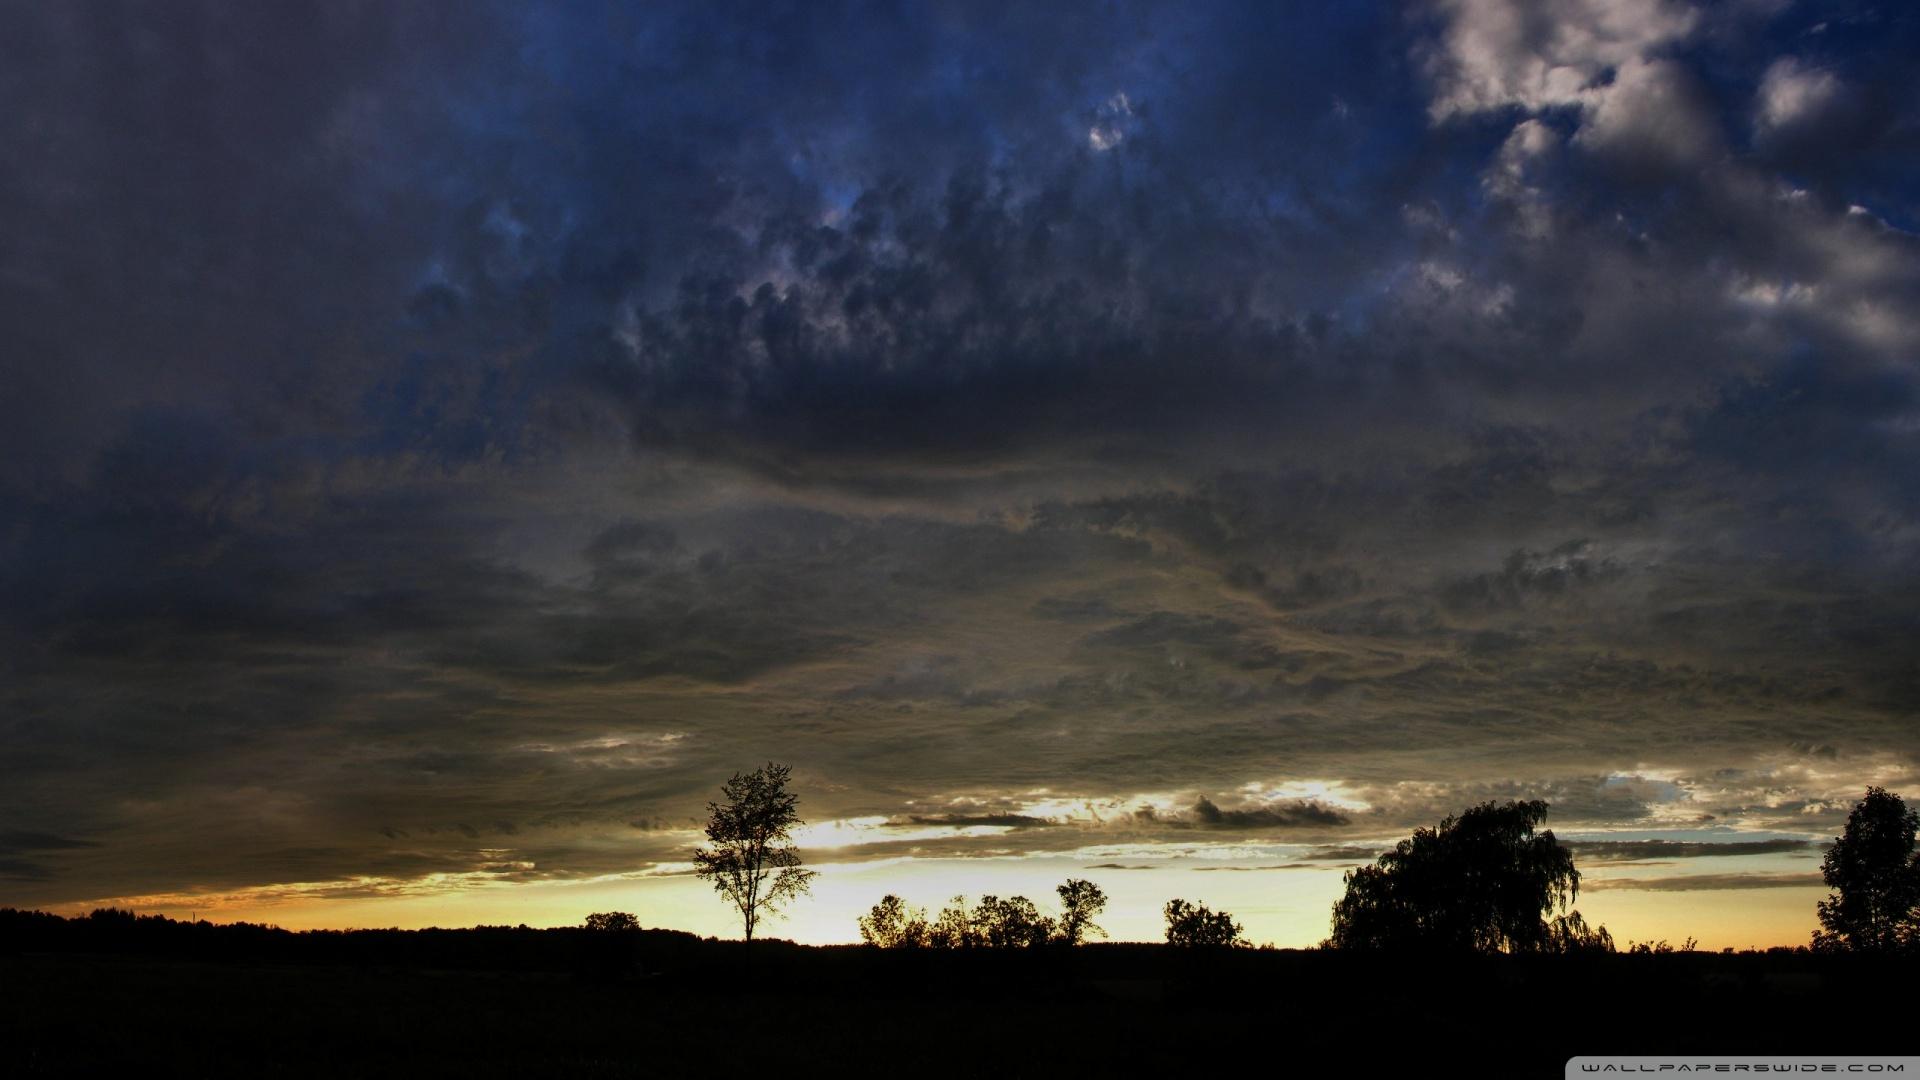 dark cloudy sky wallpaper hd